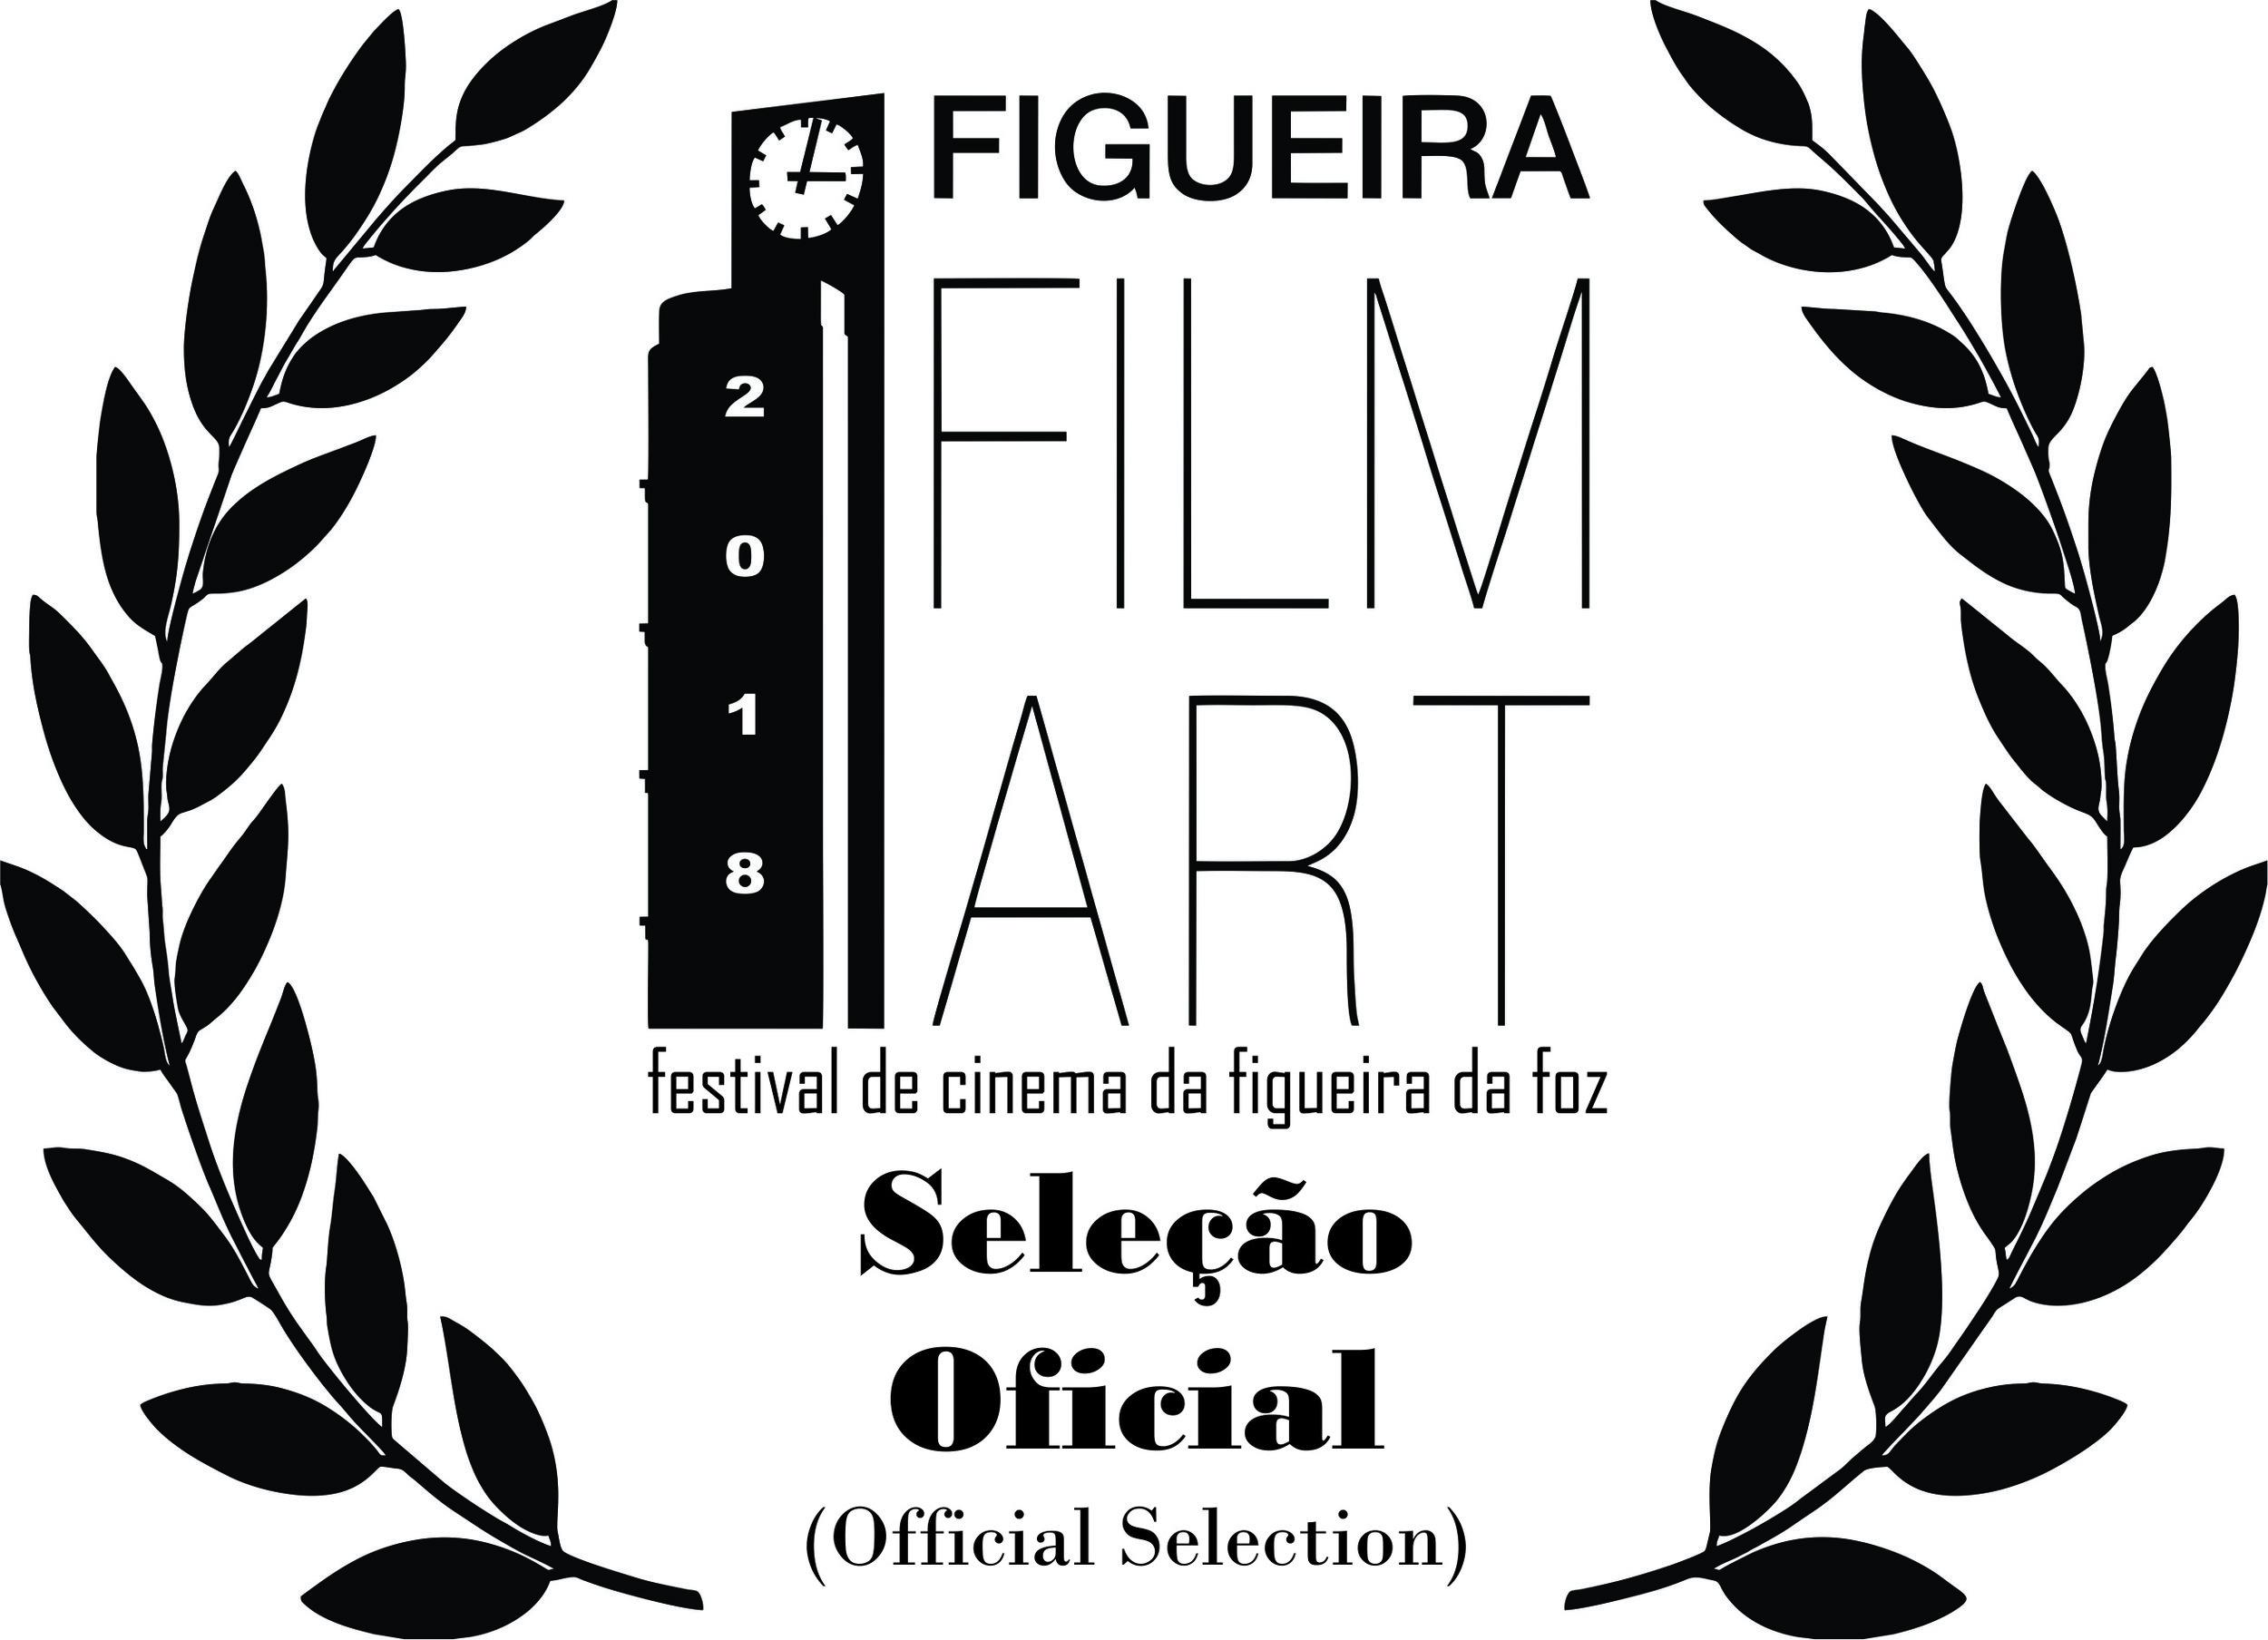 fugueira_festival_official_laurel.jpg